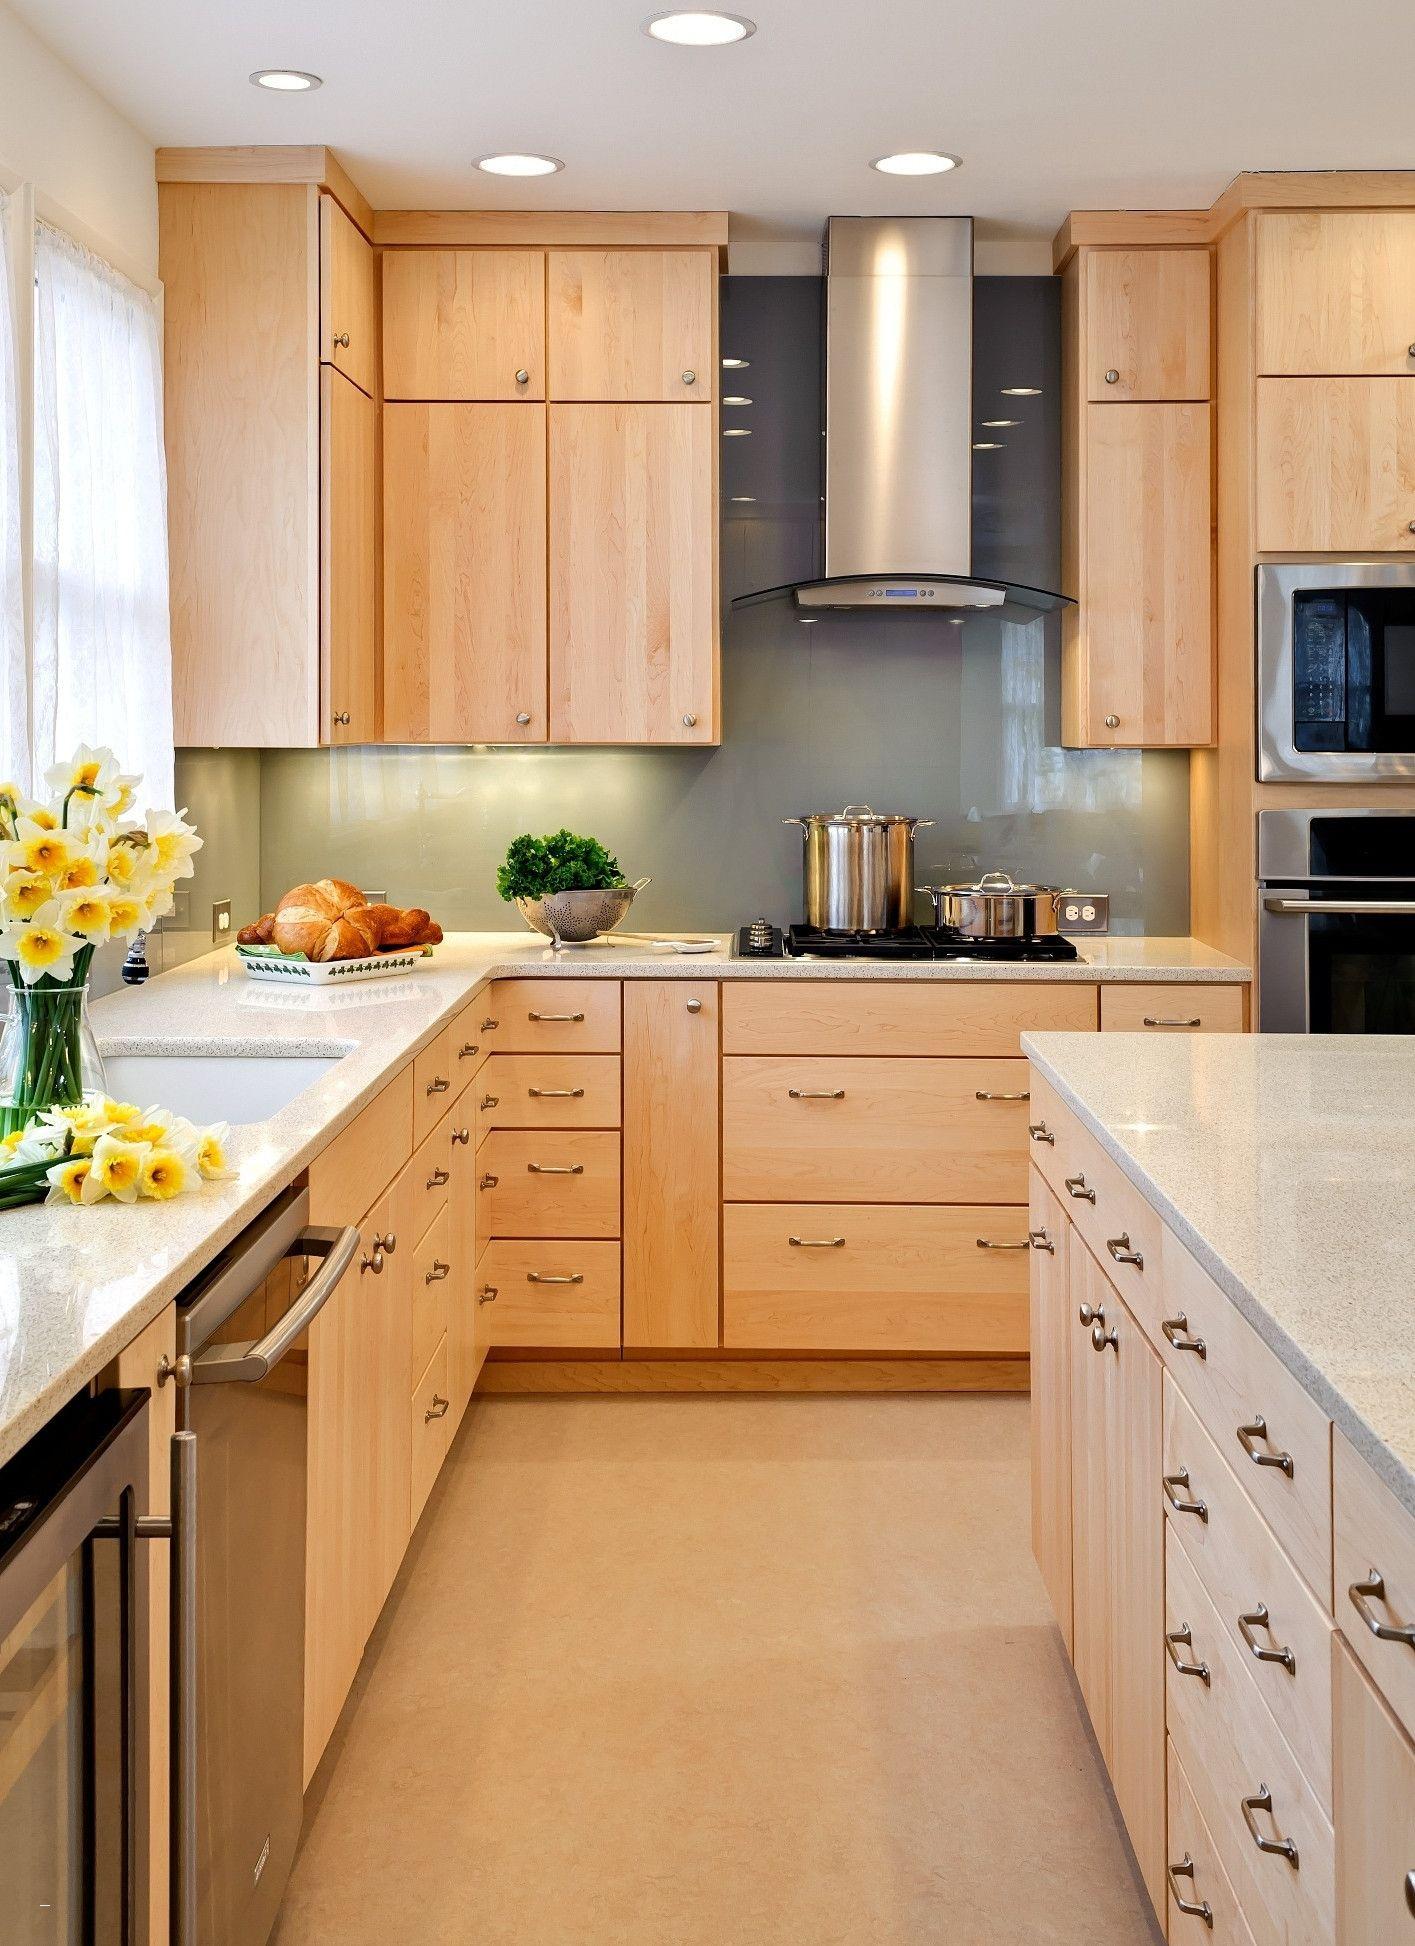 Lovely Kitchen Backsplash Ideas With Maple Cabinets Birch Kitchen Cabinets Maple Kitchen Cabinets Contemporary Kitchen